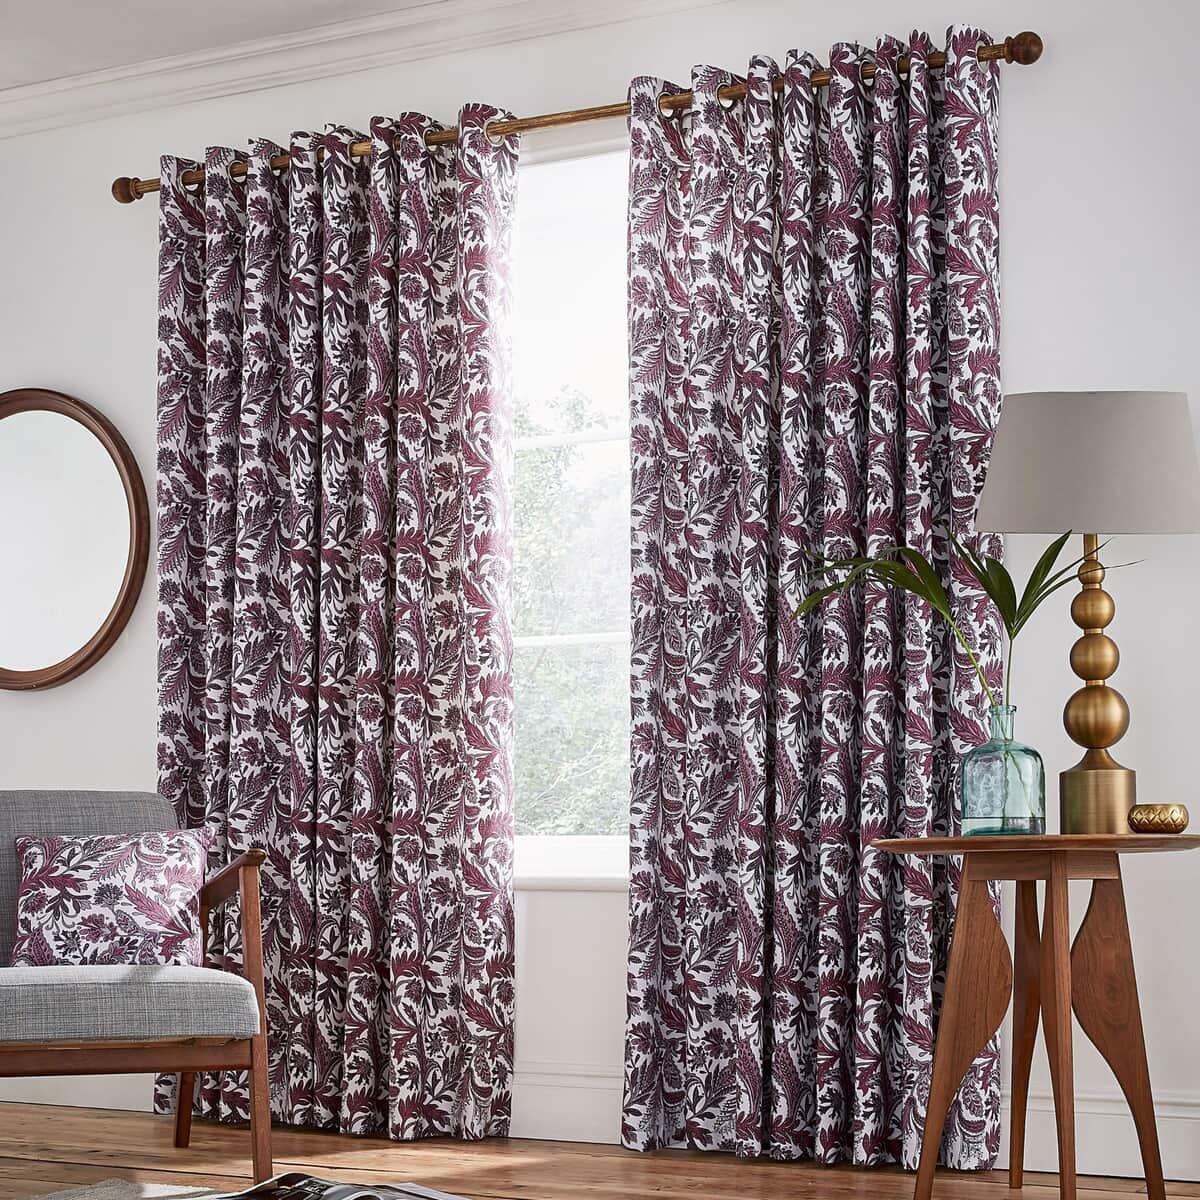 Helena Springfield Jacaranda Plum Curtains large